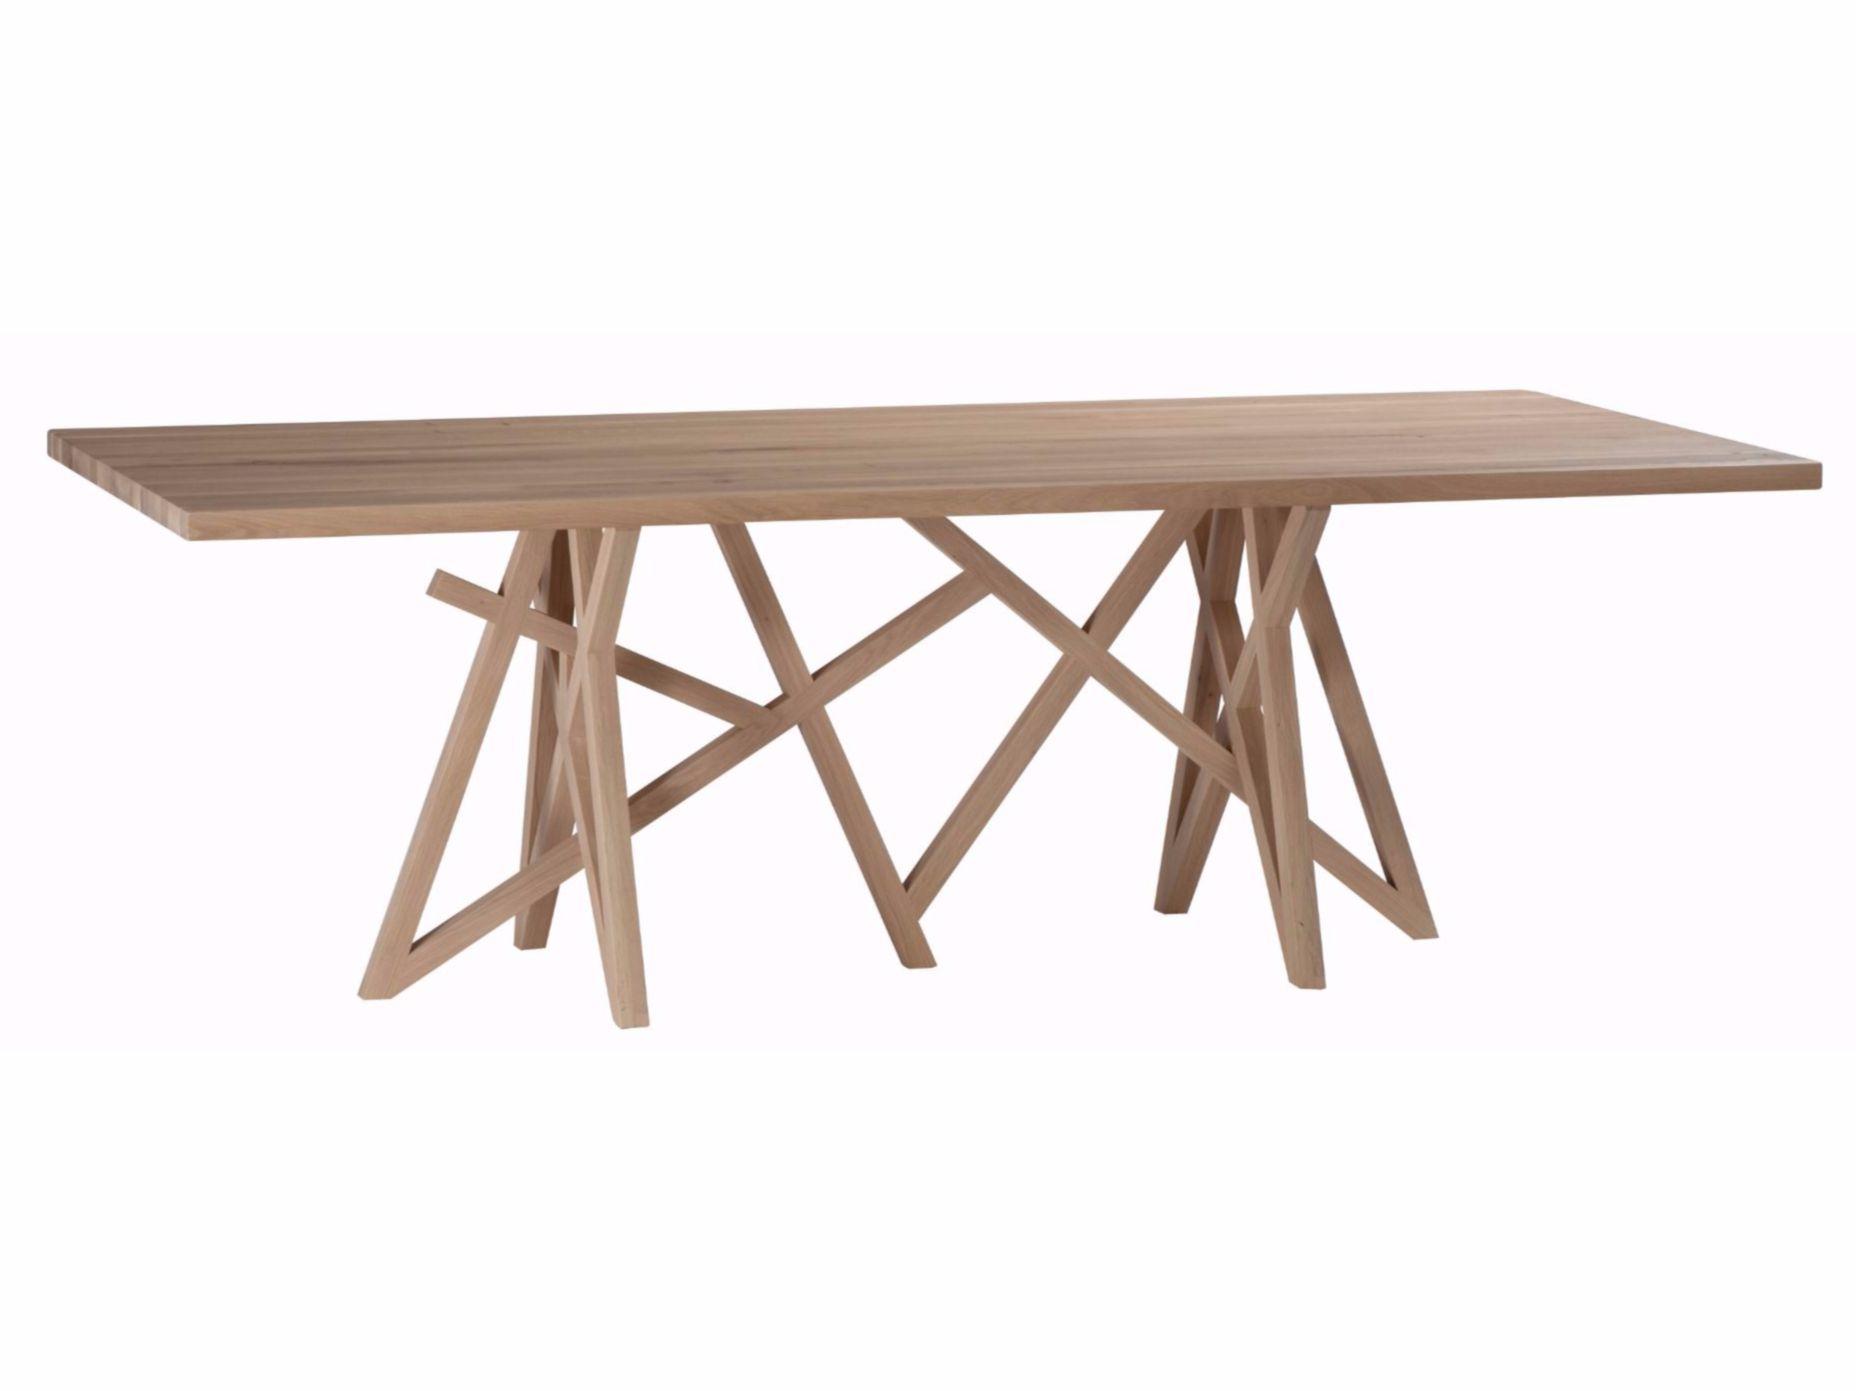 Roche bobois table a manger table repas roche bobois with for Table marbre roche bobois